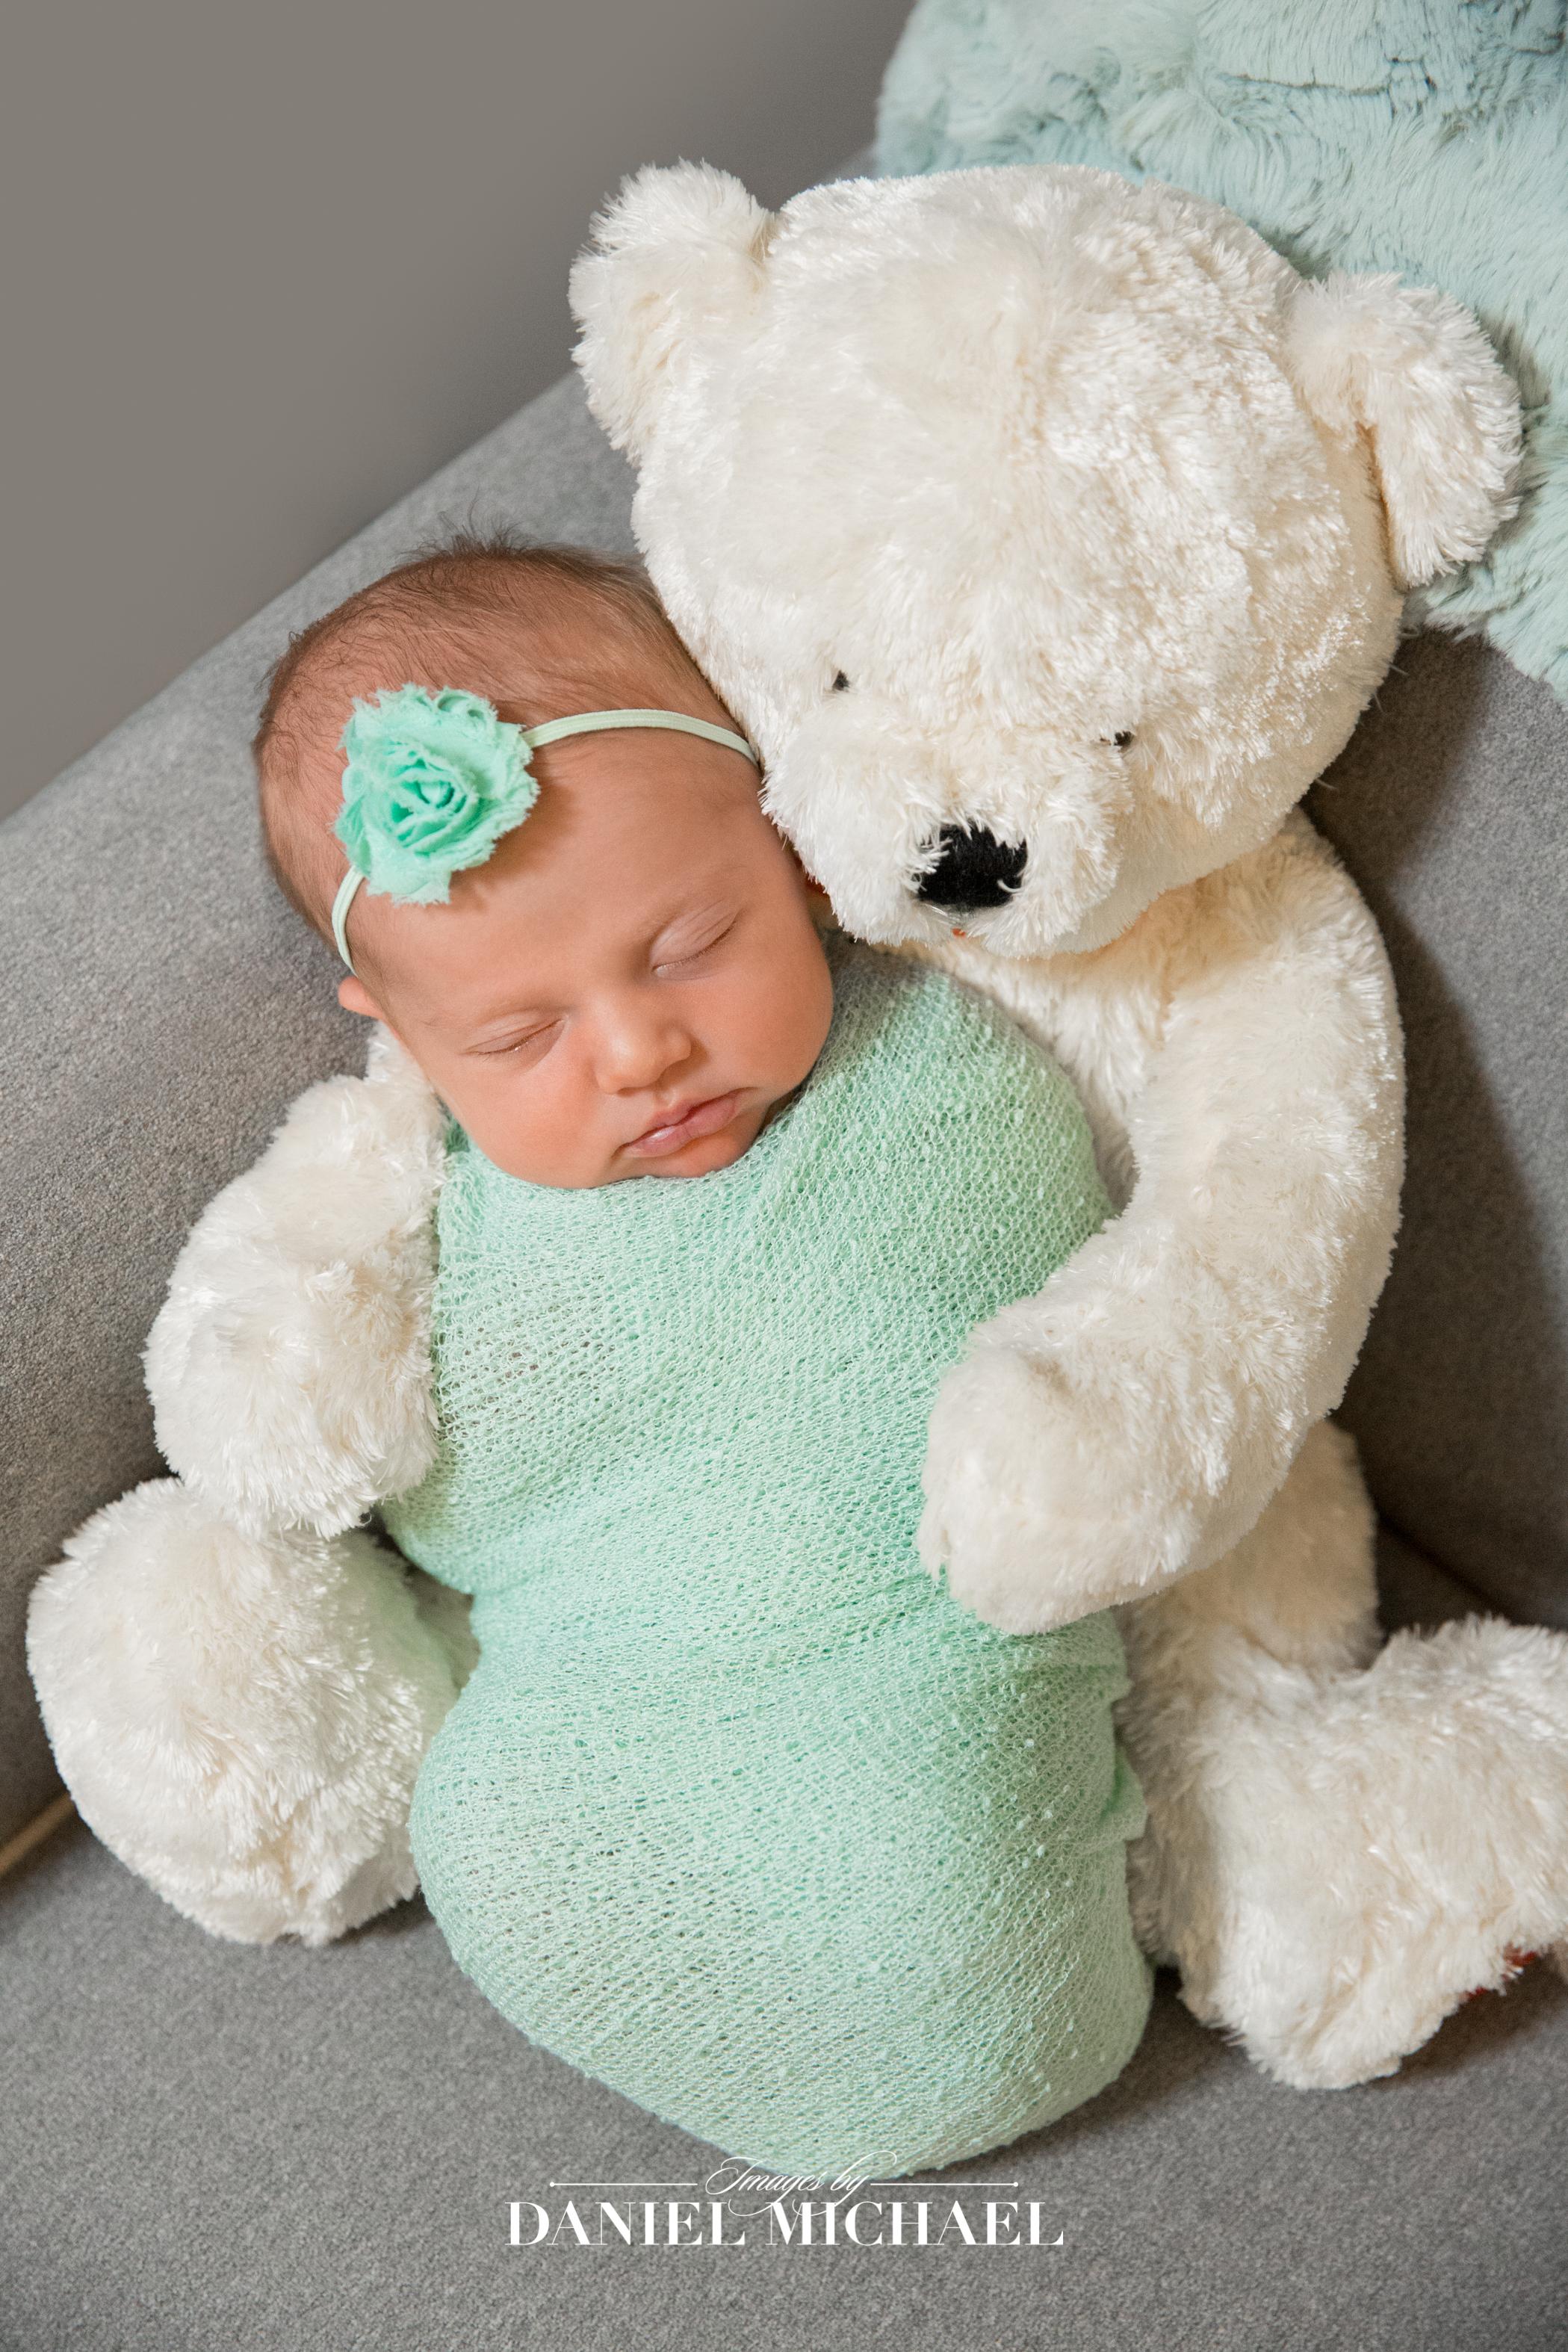 Cincinnati Lifestyle Photographer, Lifestyle Newborn, Newborn Girl, Jessica Rist